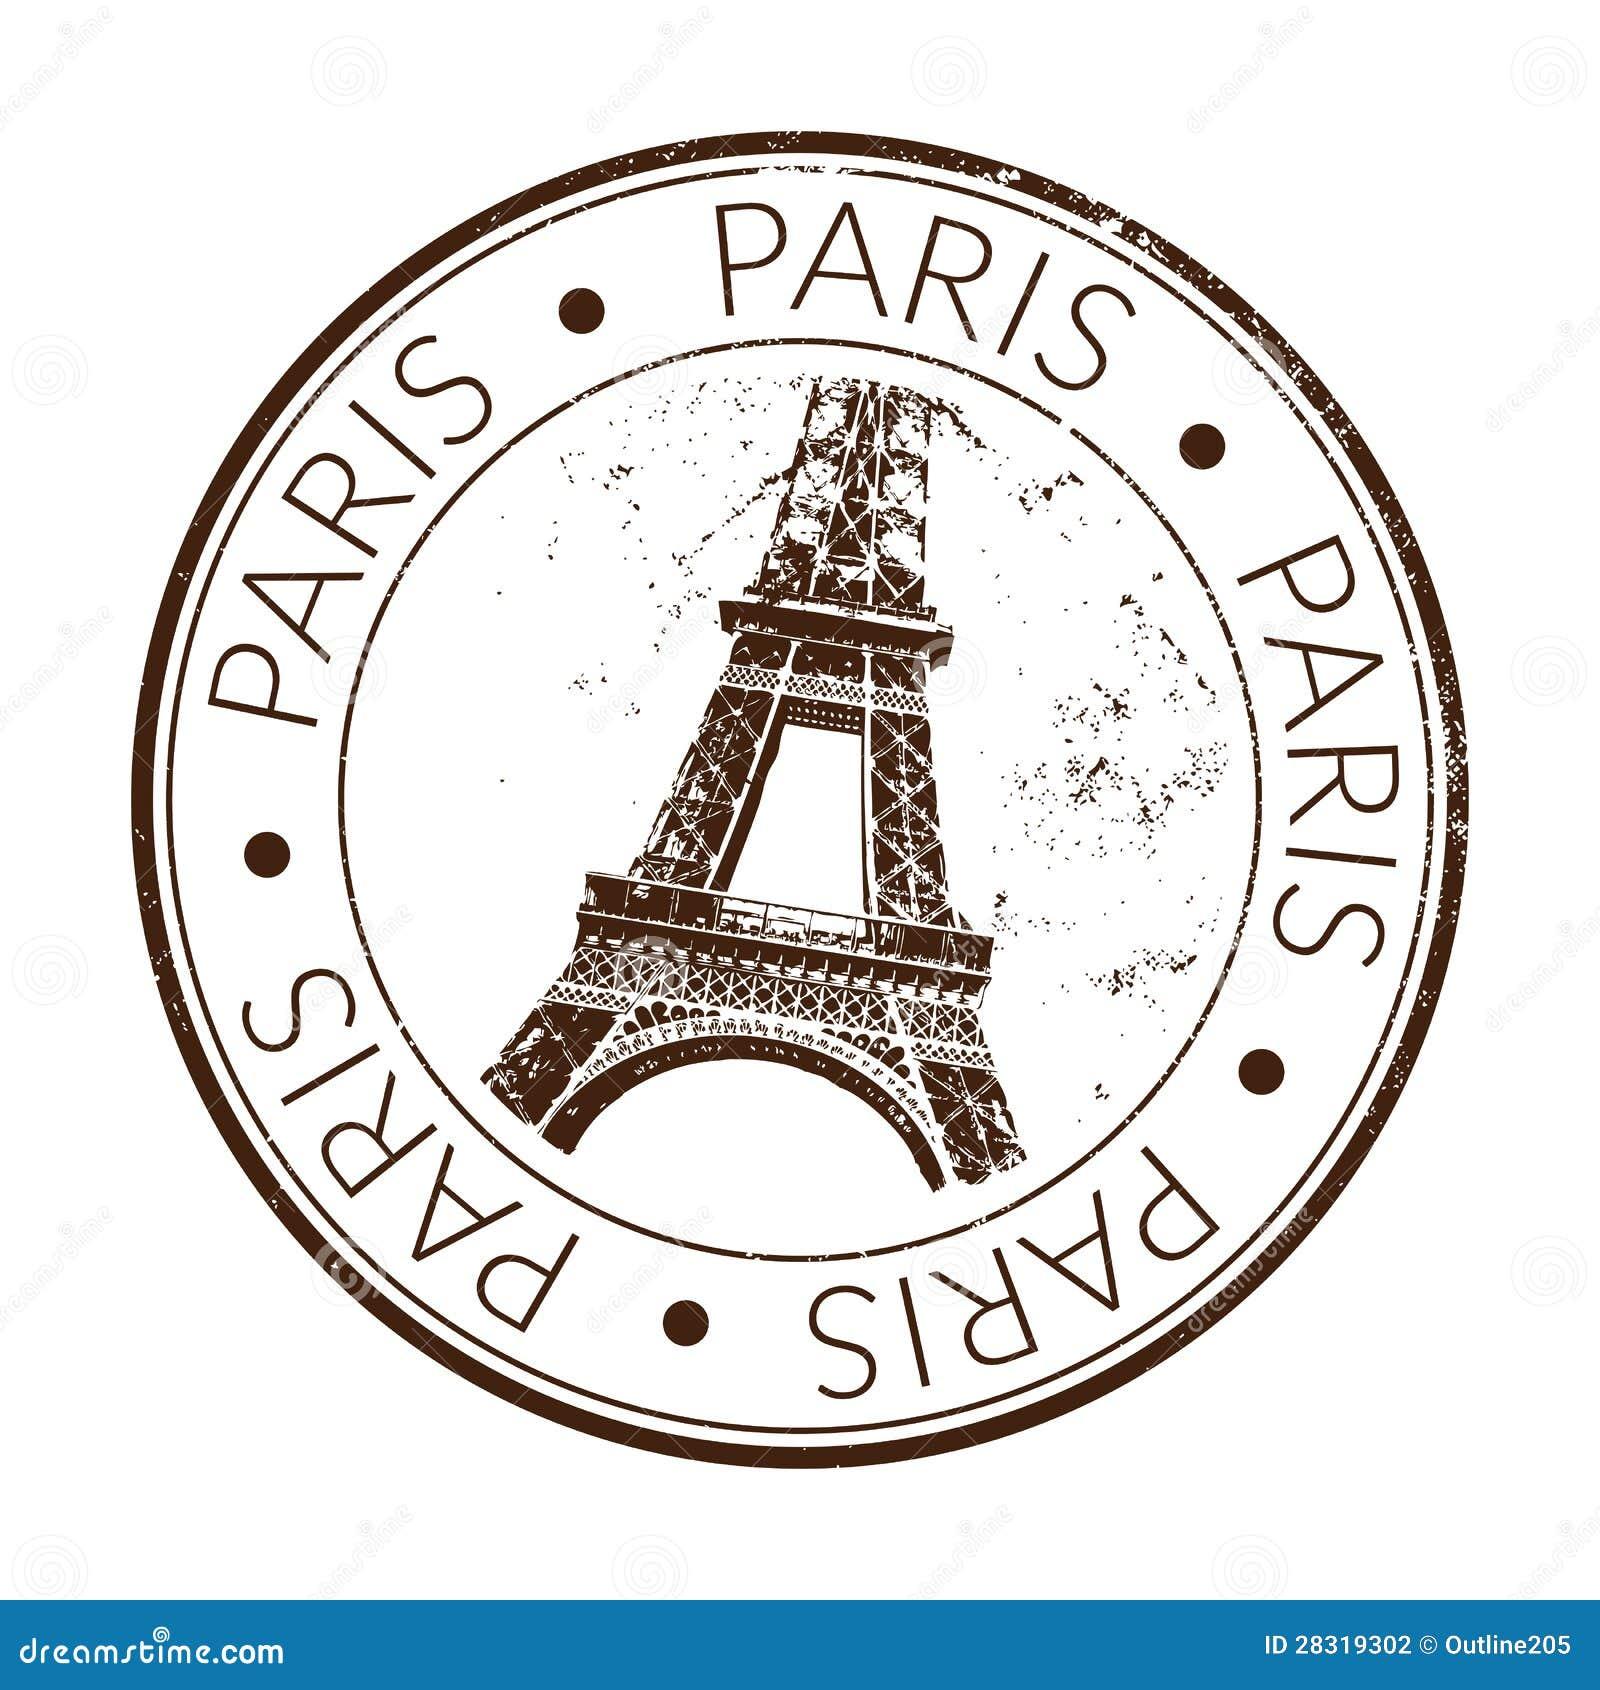 Old paris street map royalty free stock photo image 15885665 - Rubber St Mpel Paris Arkivbild